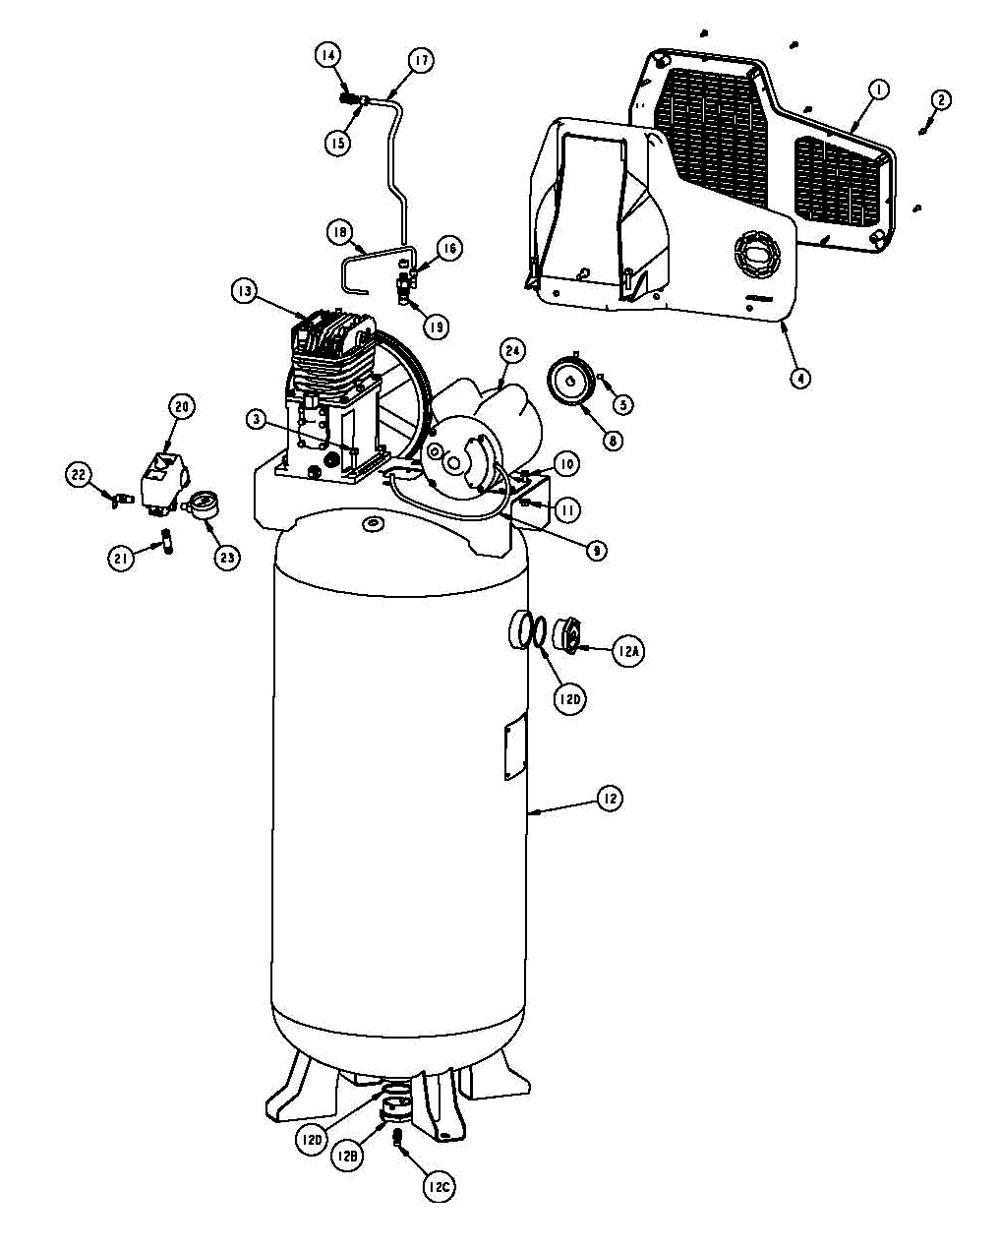 [DIAGRAM] 110v Airpressor Wiring Diagram FULL Version HD